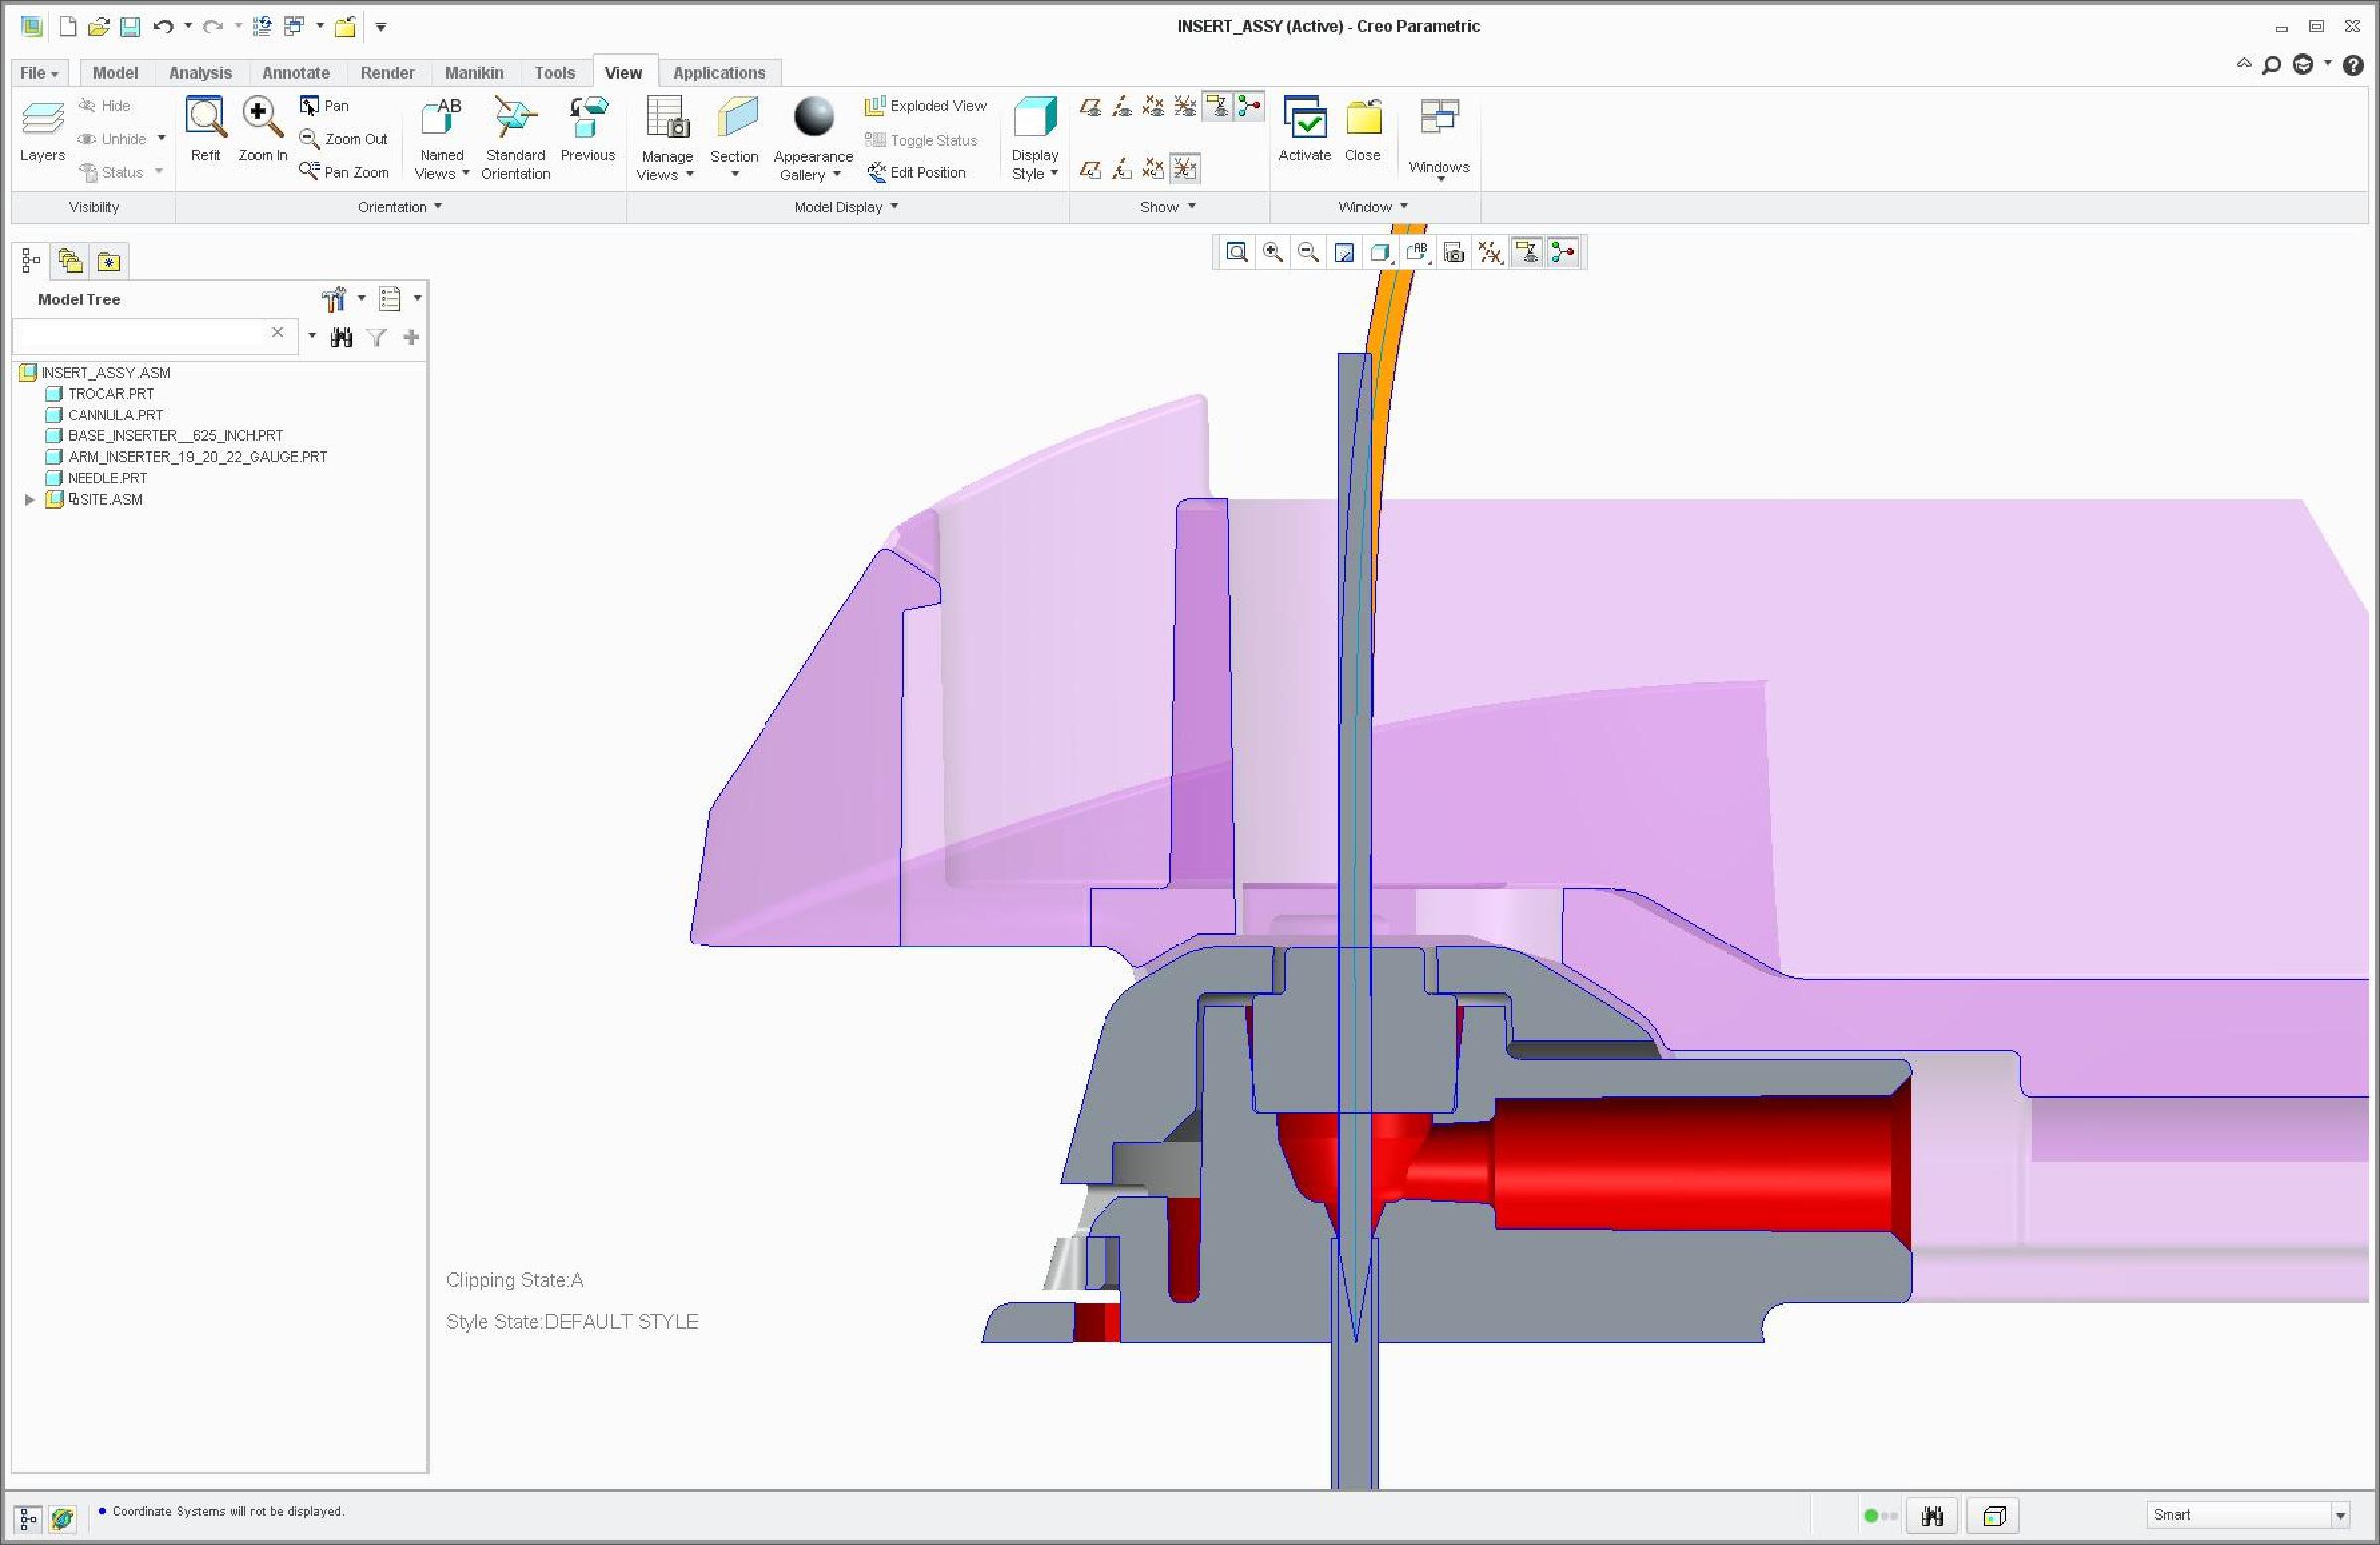 Sigmetrix - Creo 1D Tolerance Analysis software